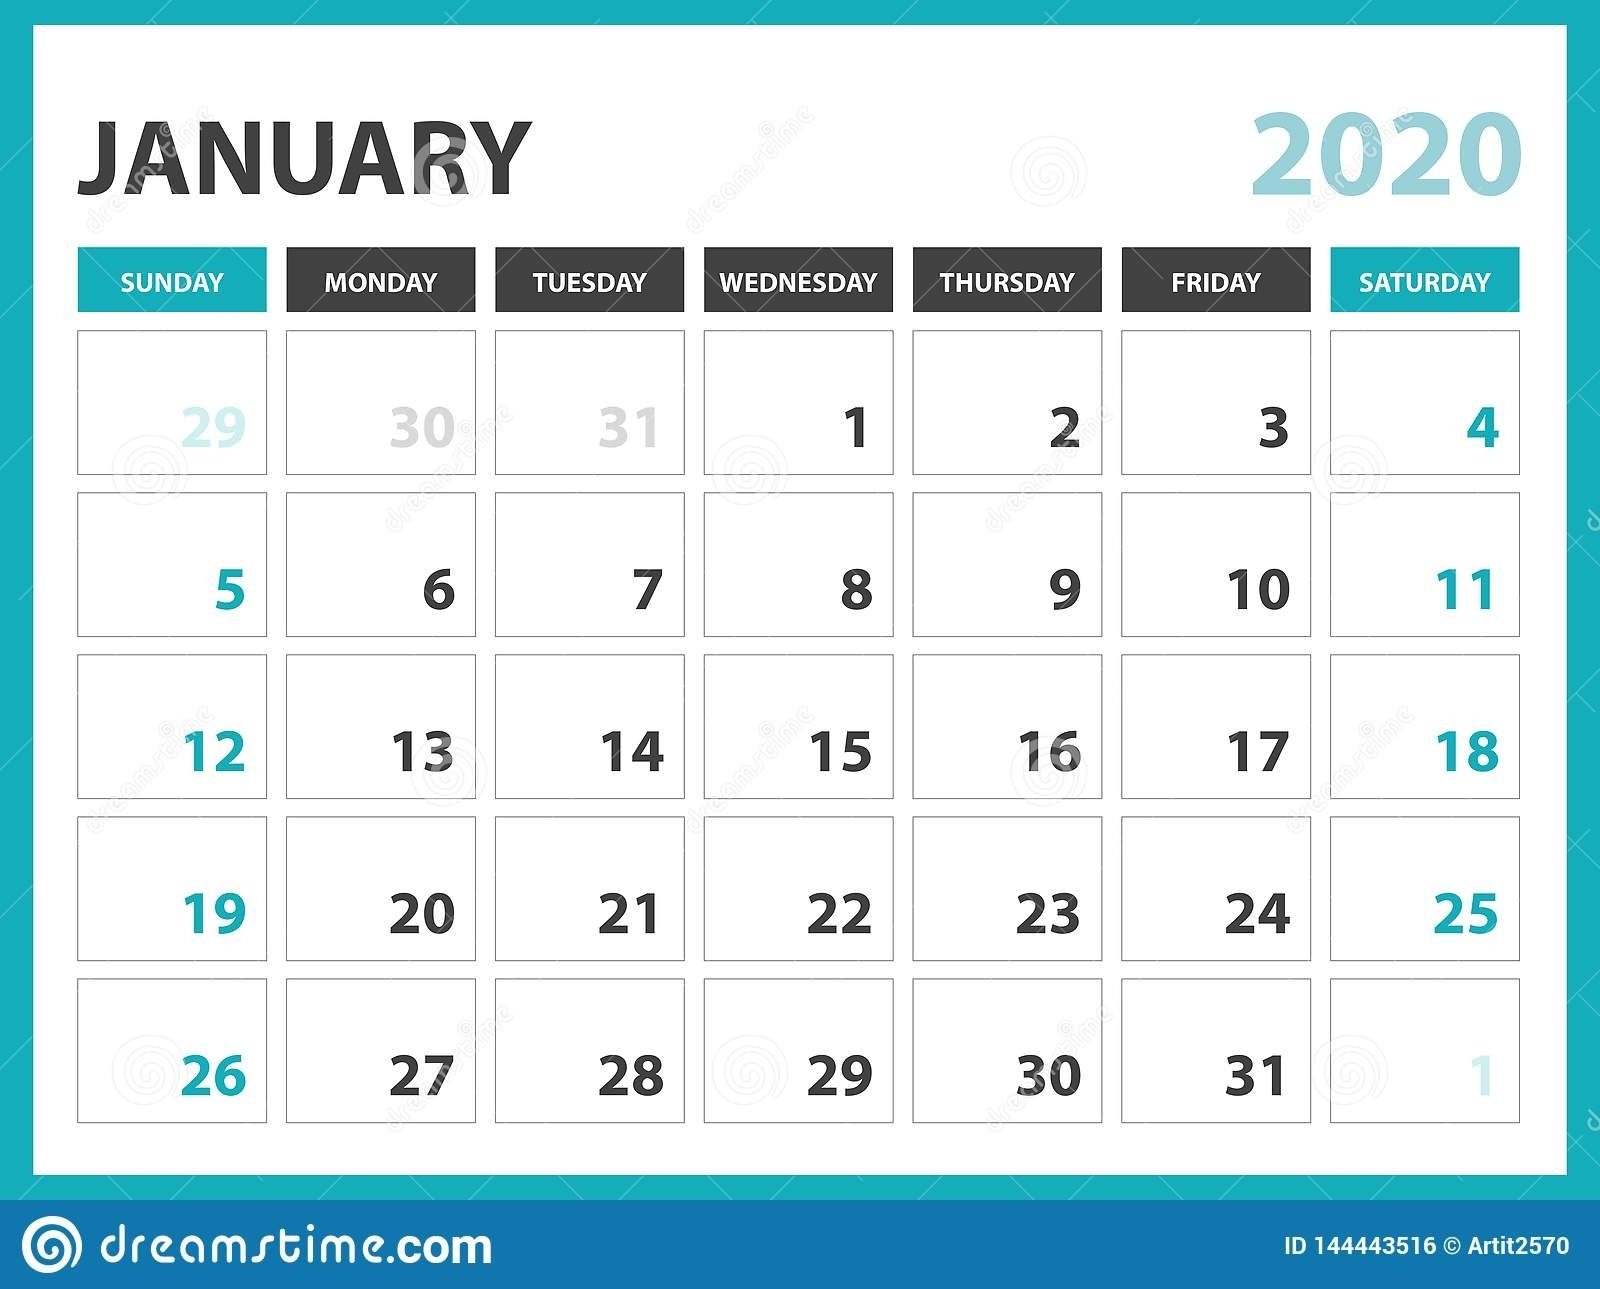 Get 6 Week Schedule Template